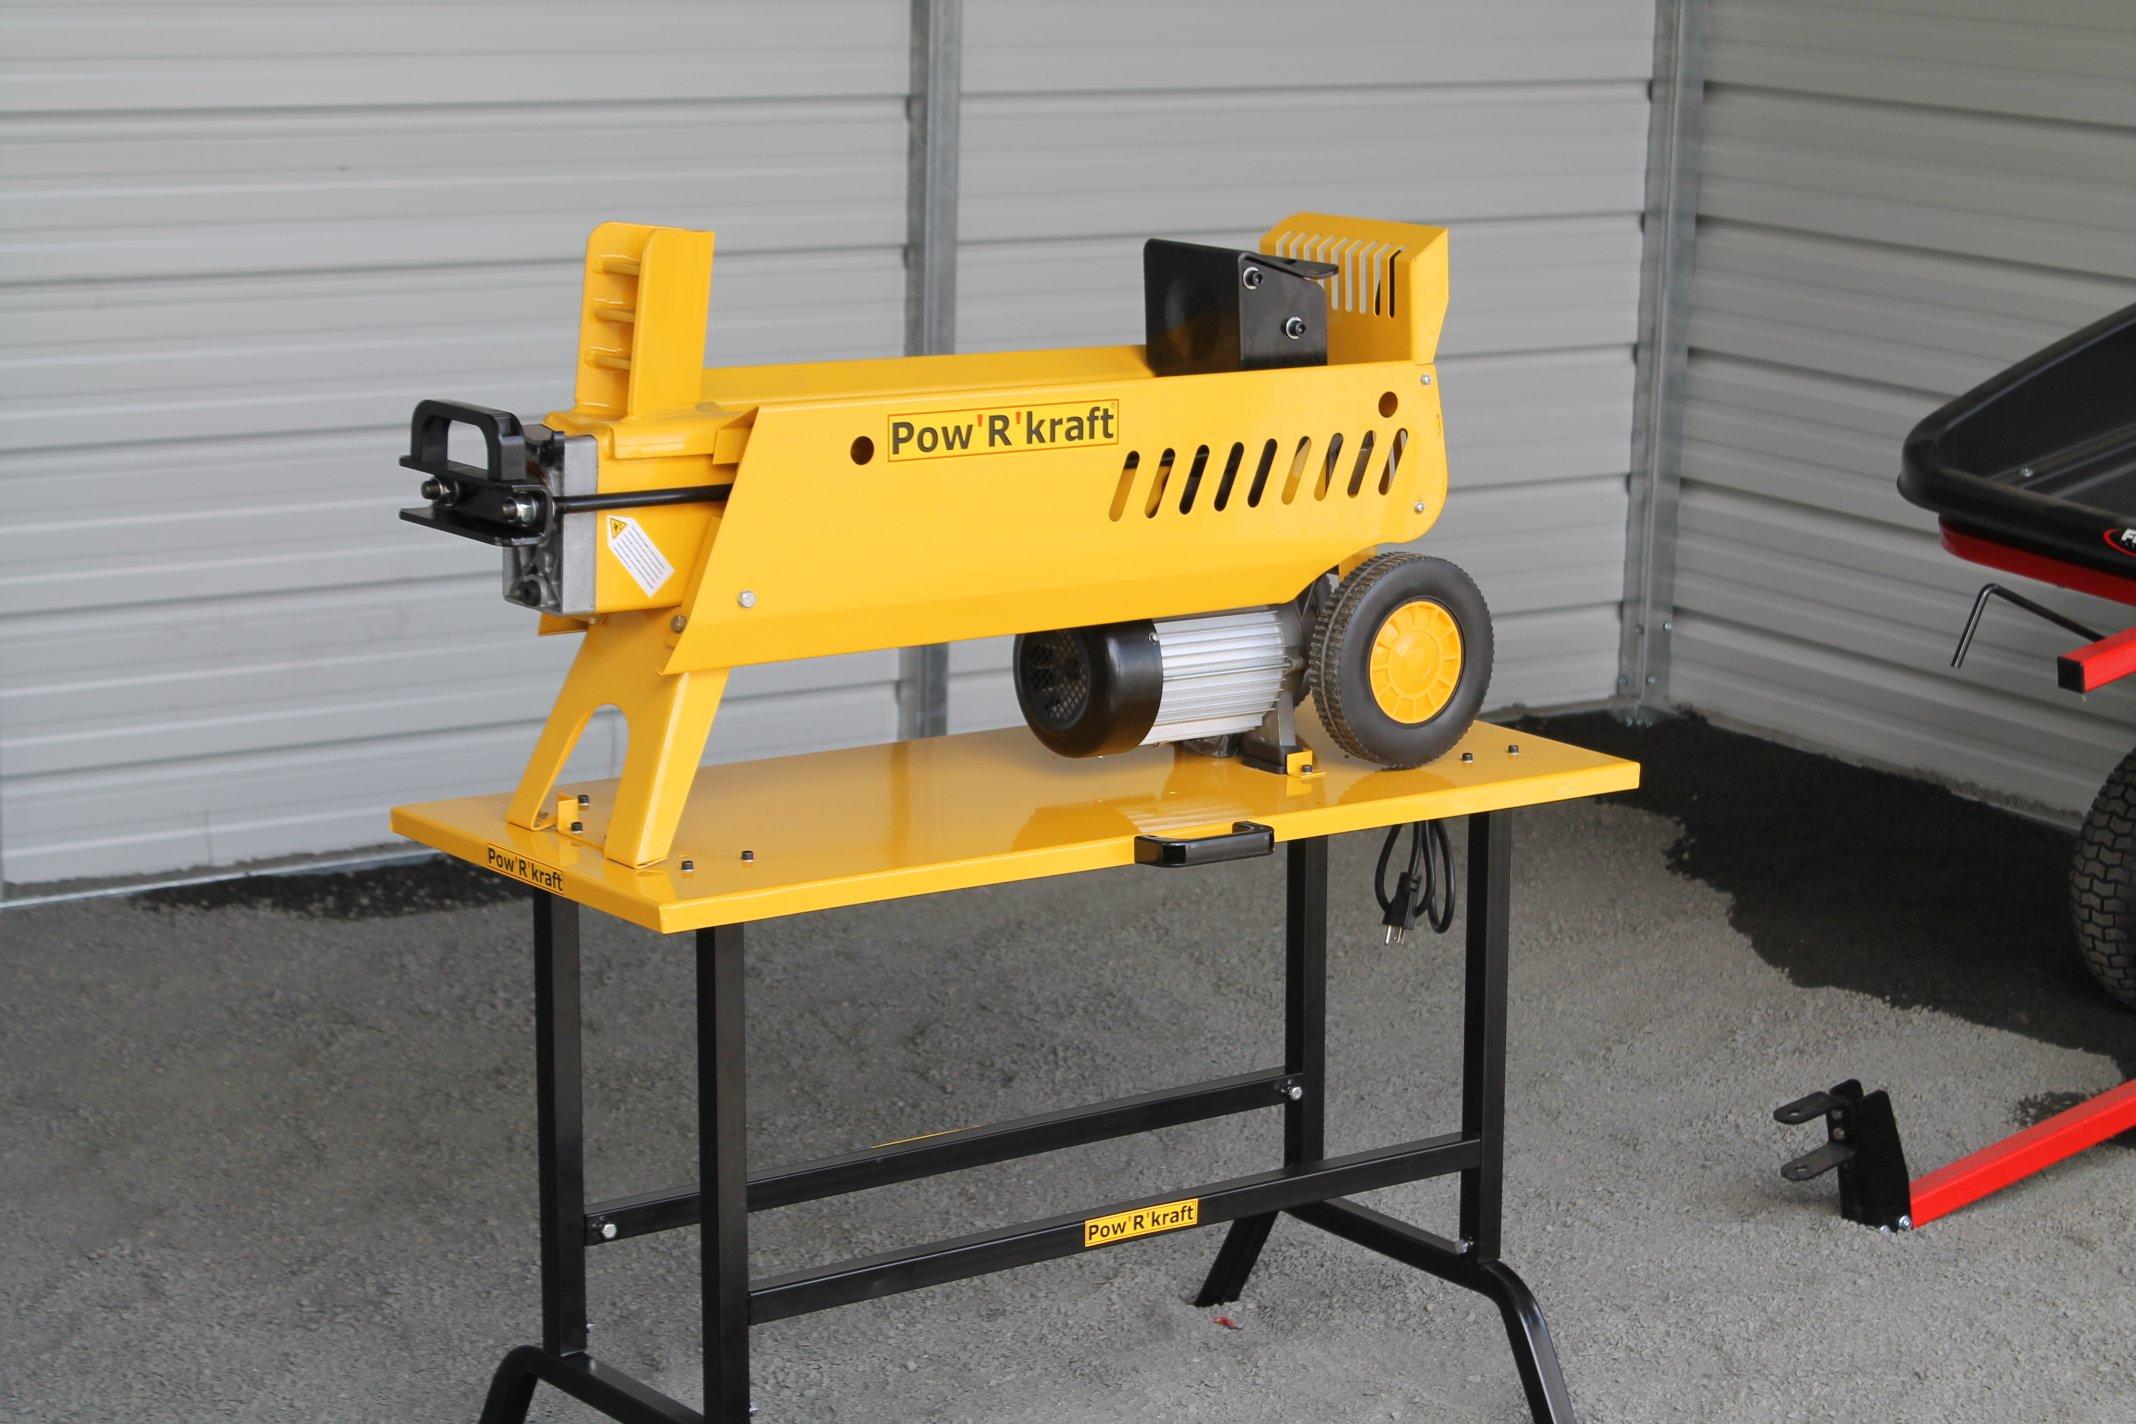 Log Splitter,7-Ton Pow'R'kraft w/ 2-Speed~Power Stroke & Stand (PK65575+02960)